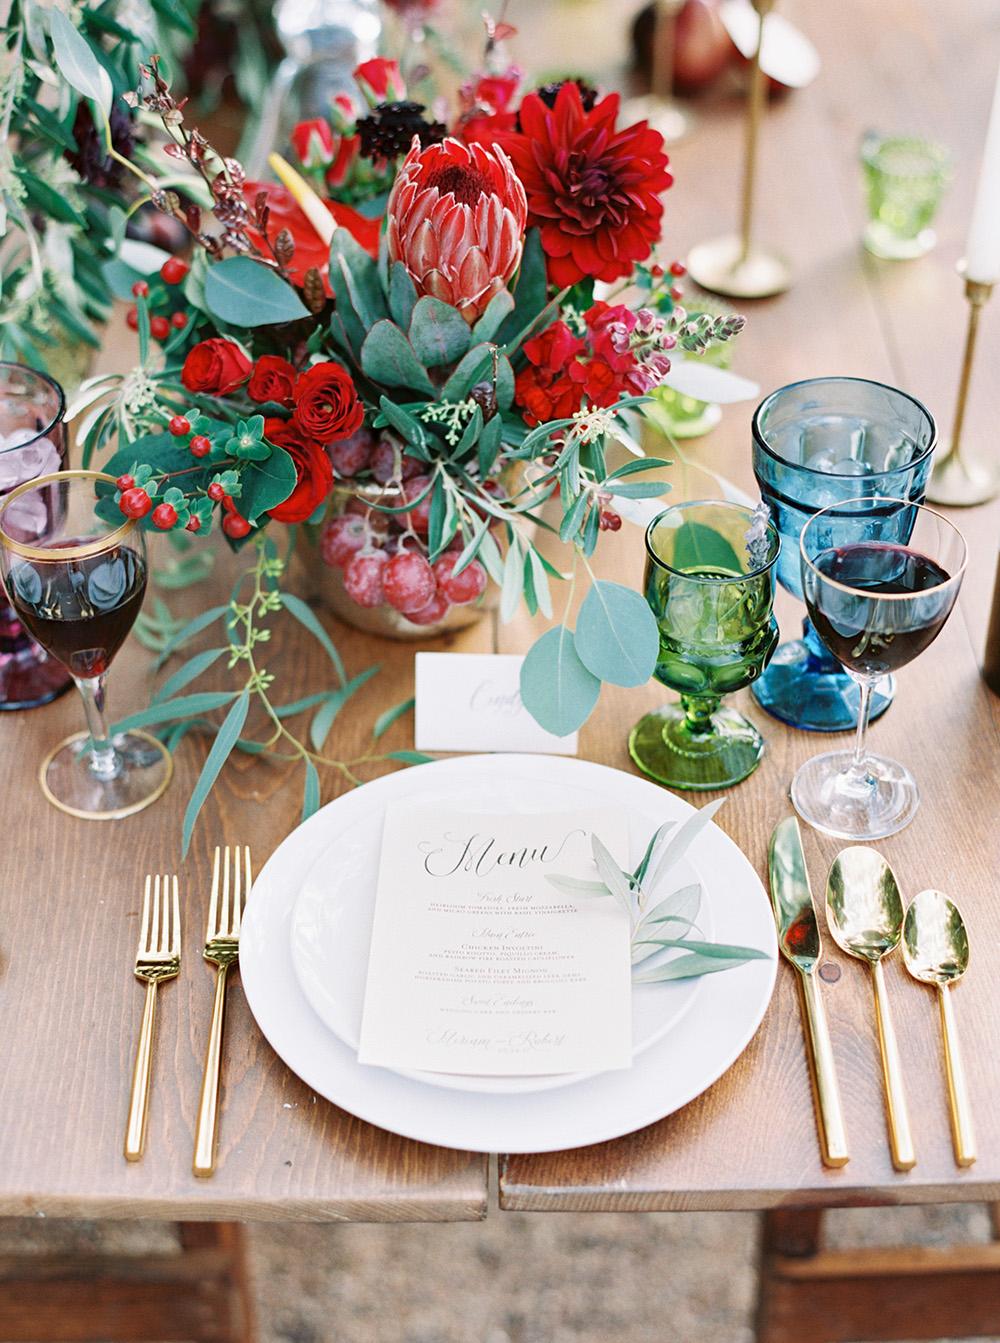 romantic table settings - photo by Melissa Jill http://ruffledblog.com/fruit-filled-vineyard-wedding-inspiration